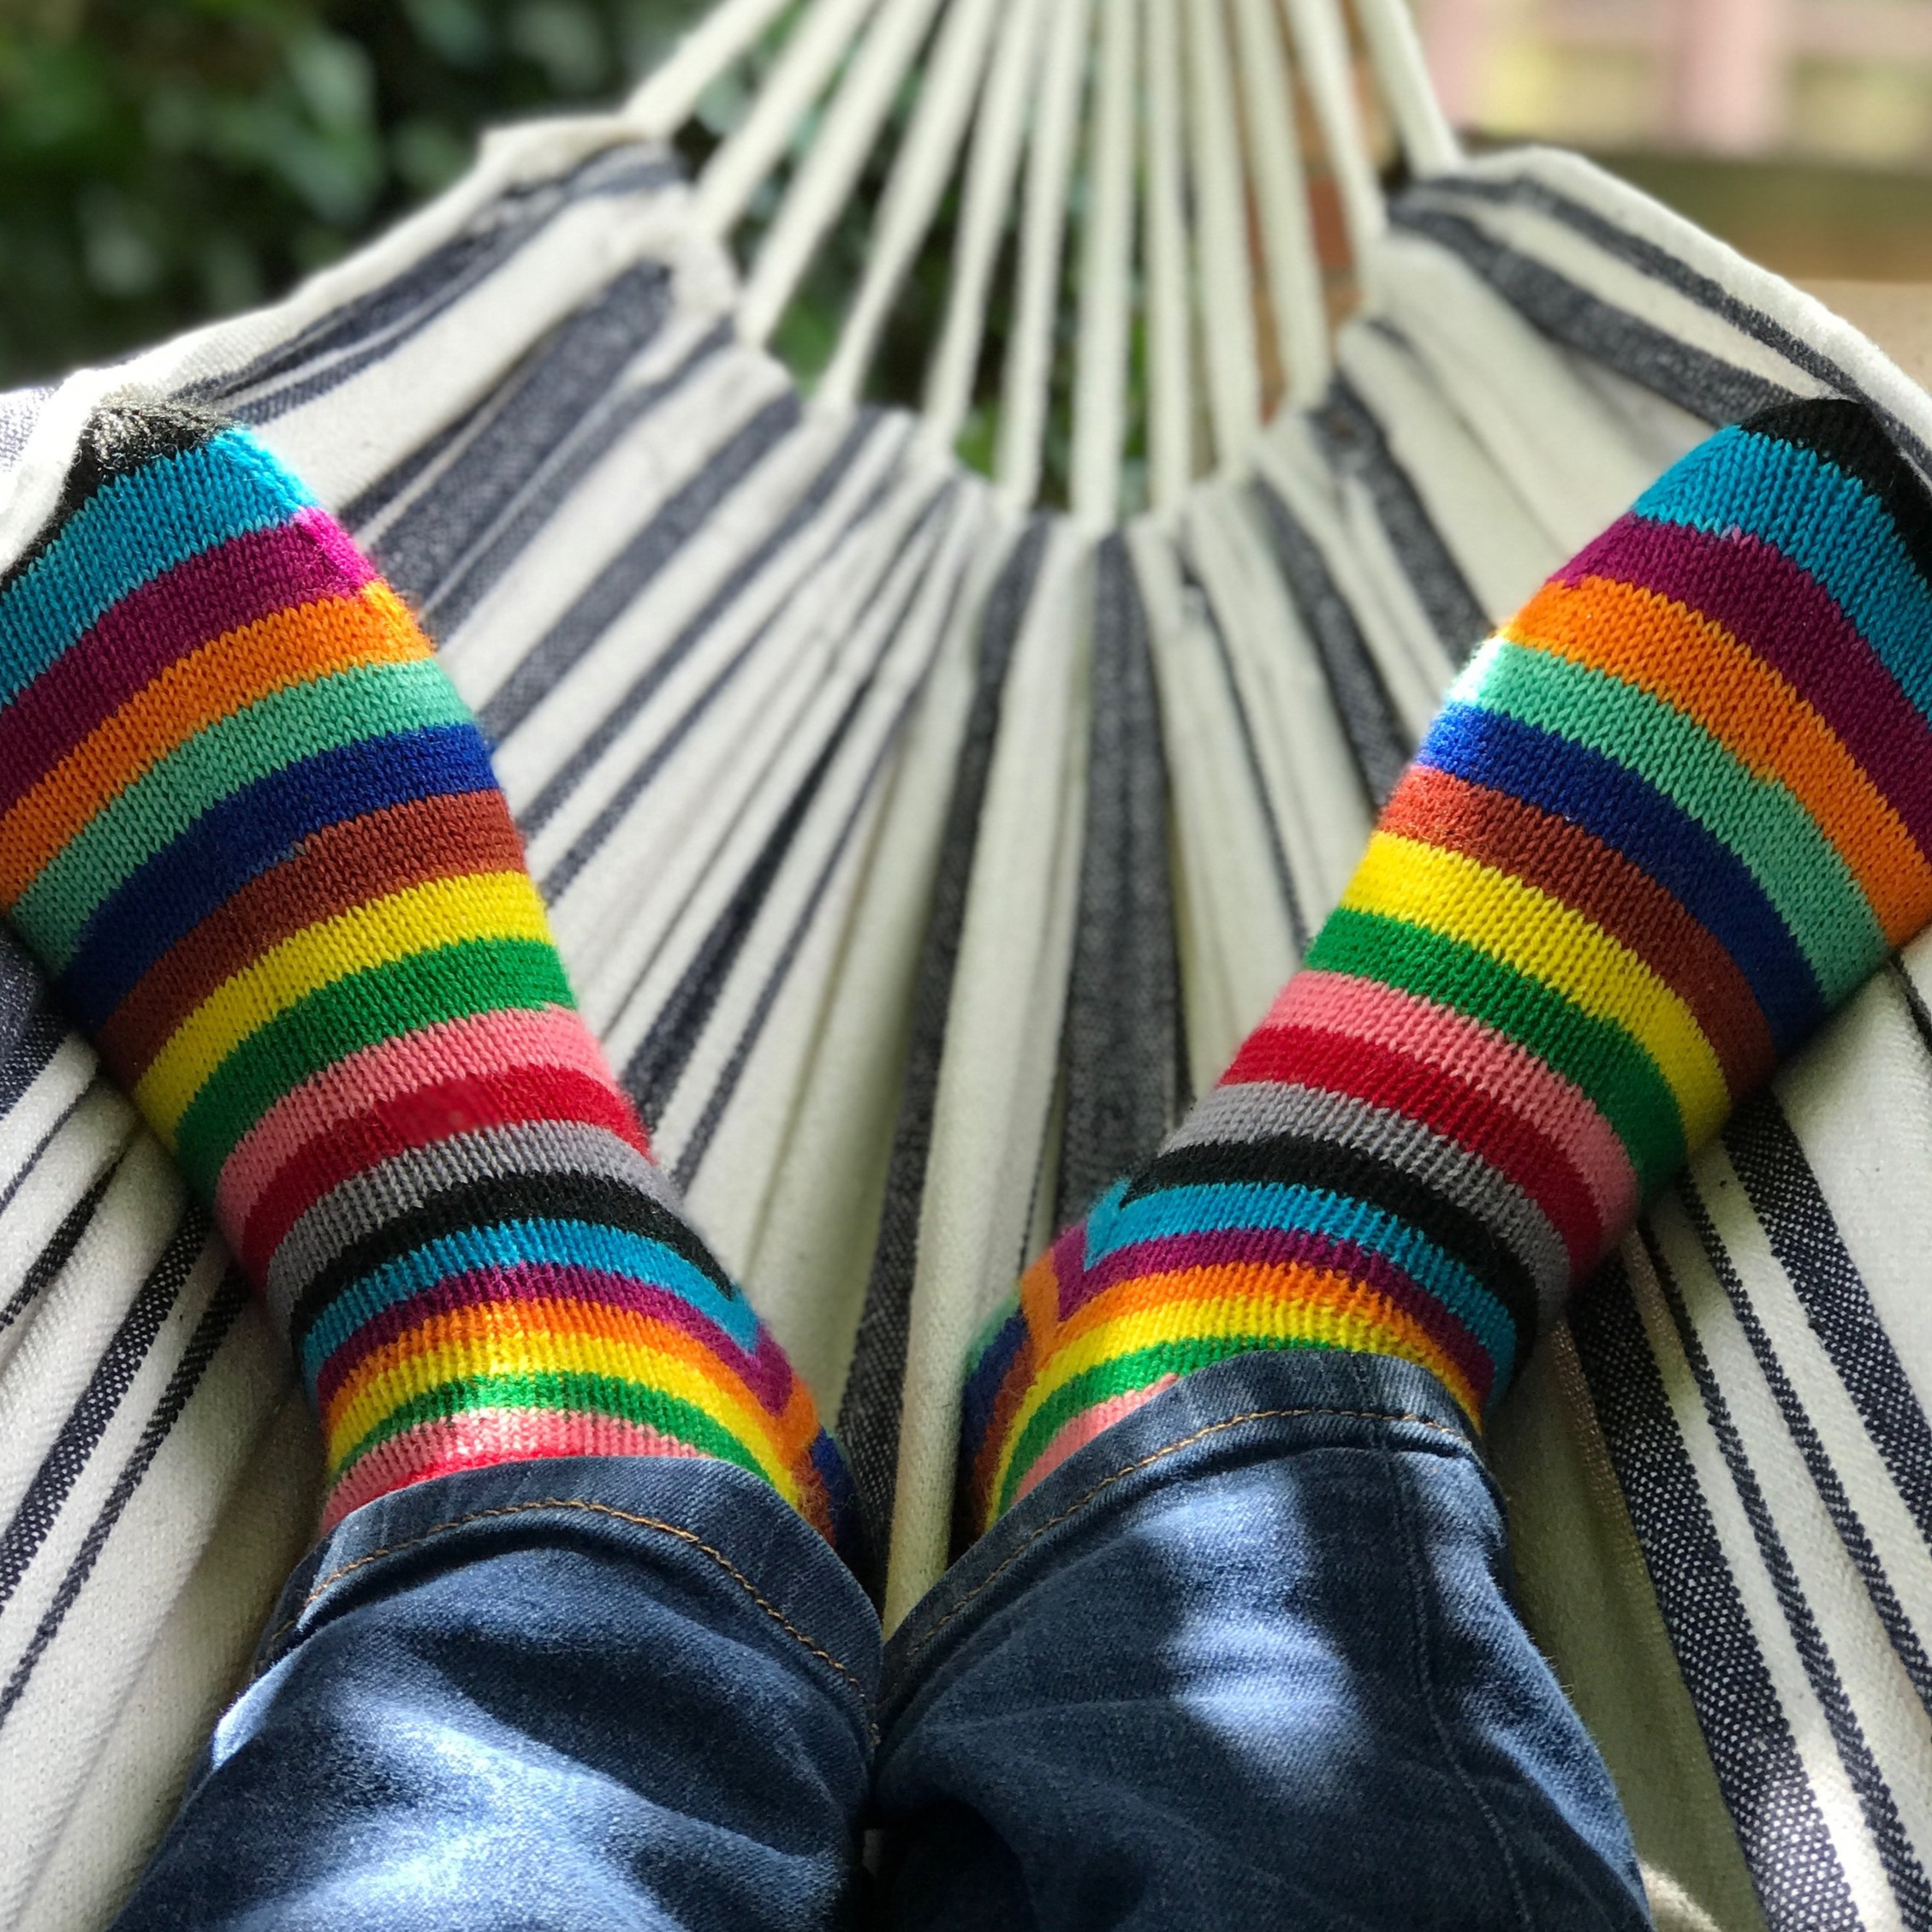 Mind+the+gap+socks.jpg